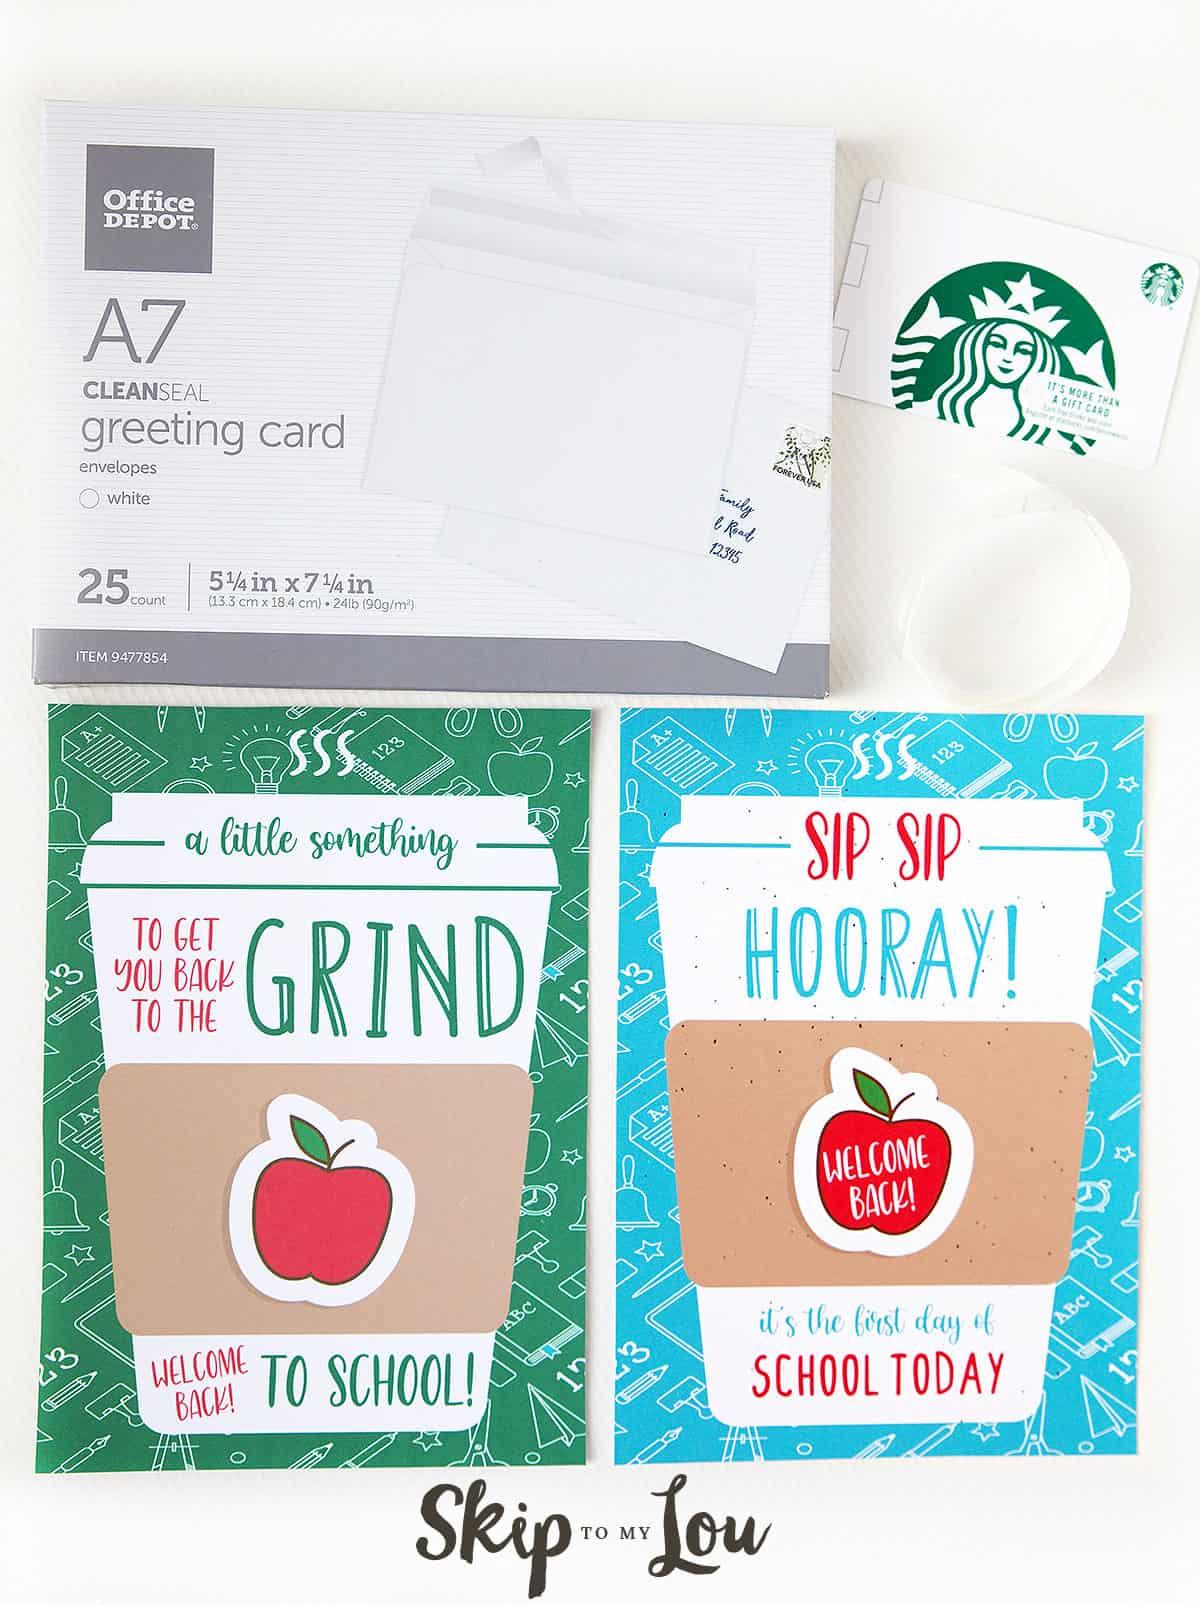 envelopes glue dots coffee gift card back to the grind printable card sip sip hooray printable card